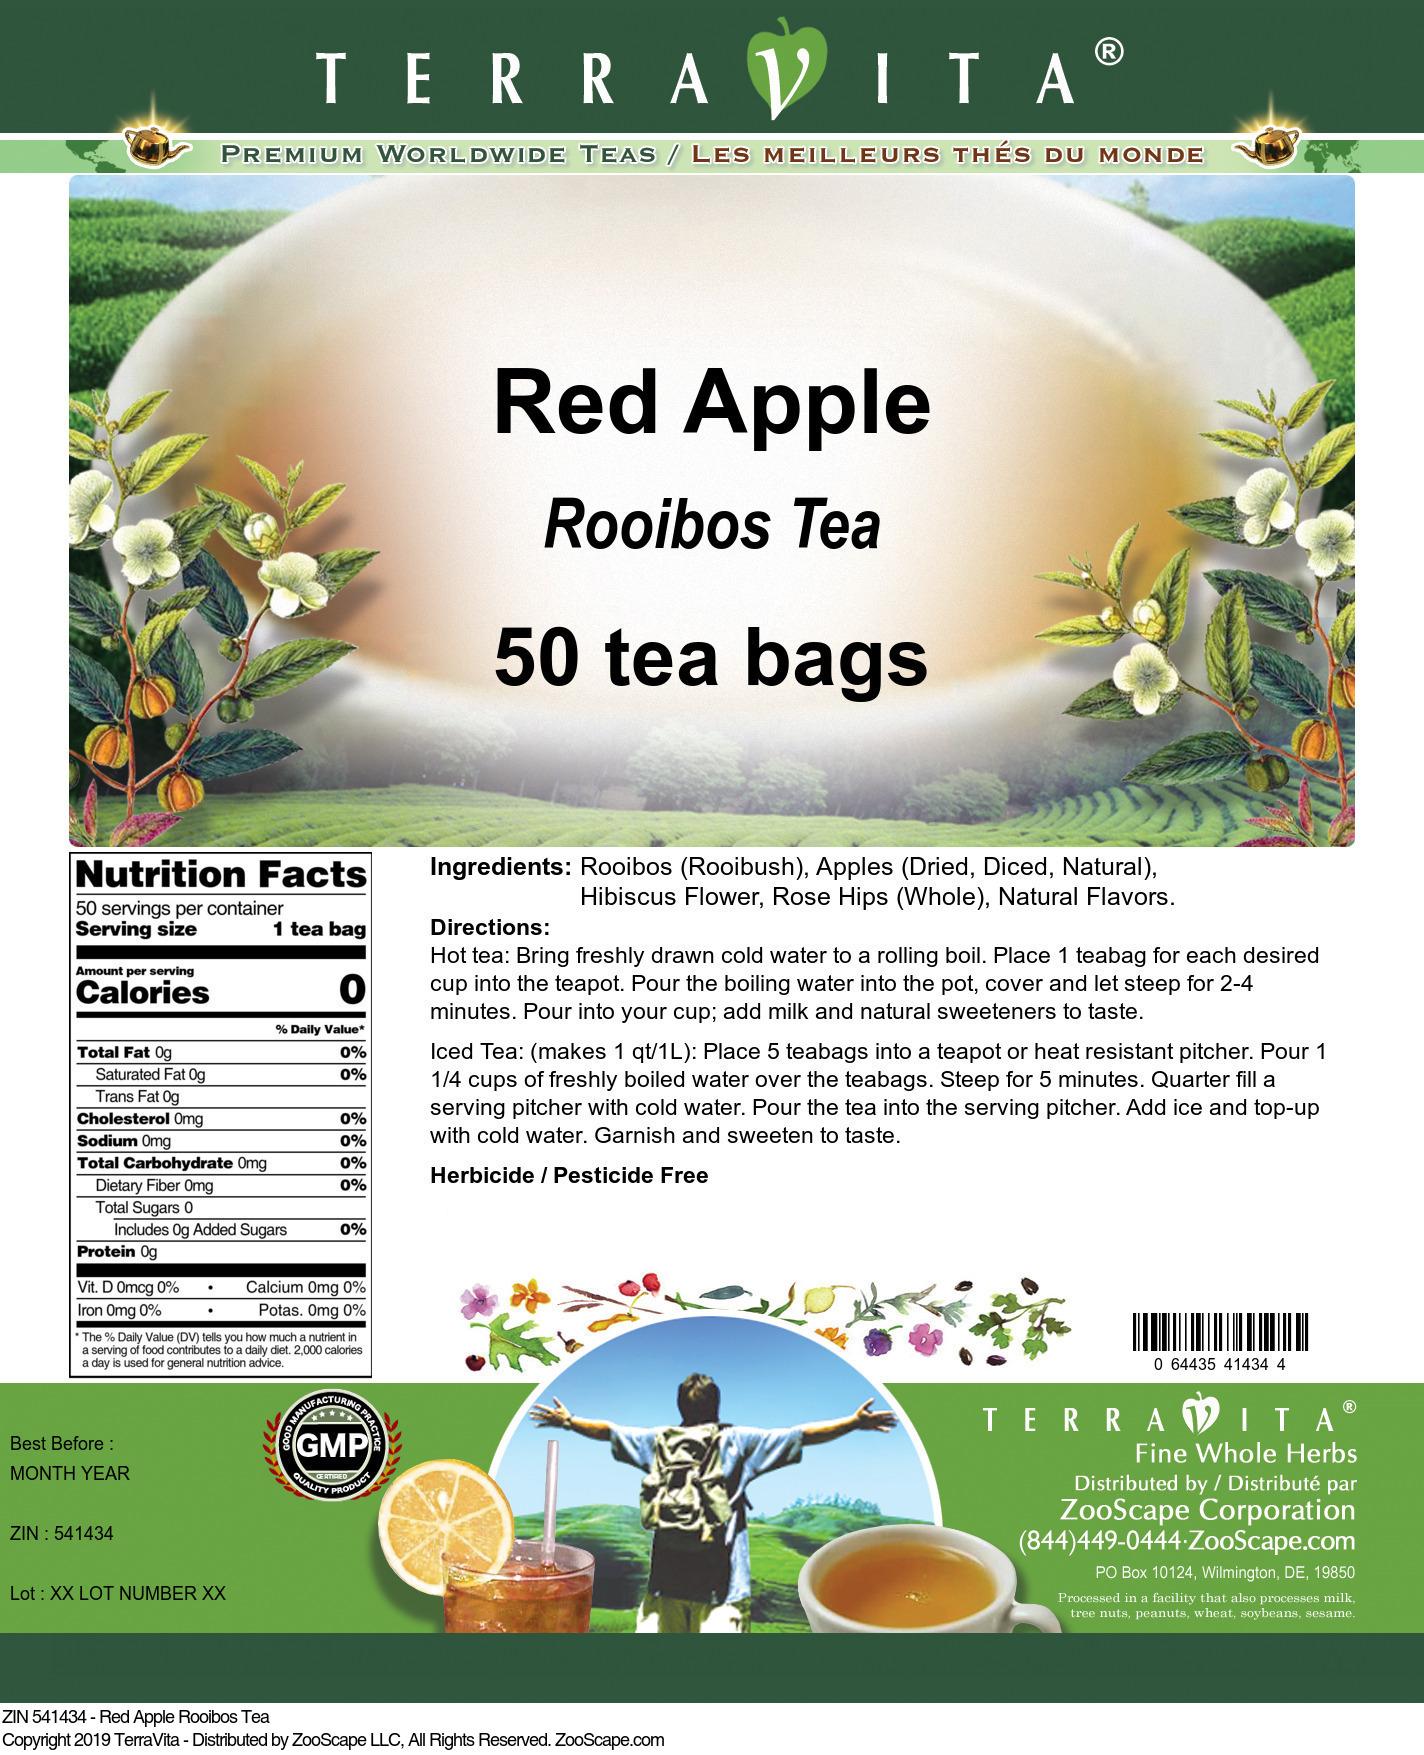 Red Apple Rooibos Tea